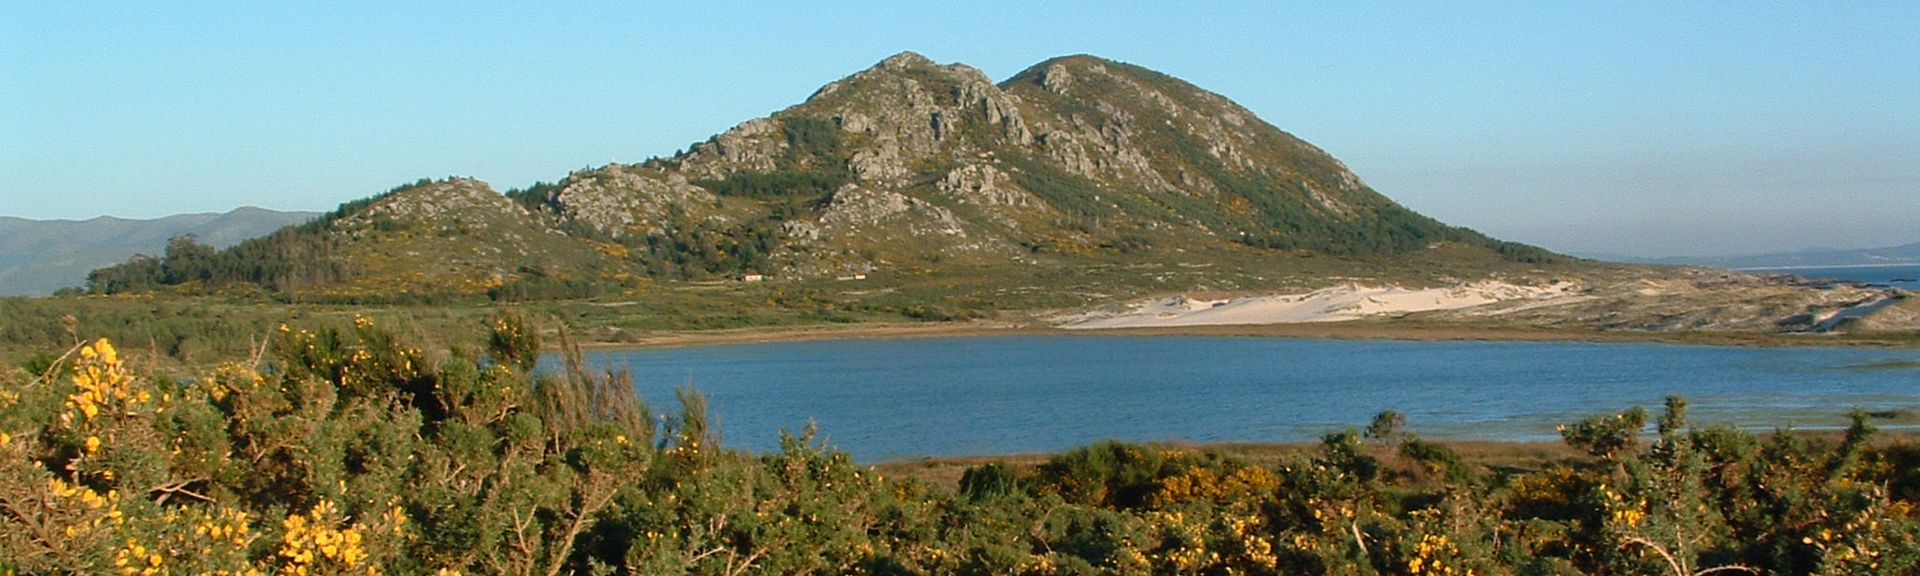 Carnota, Galizien, Spanien